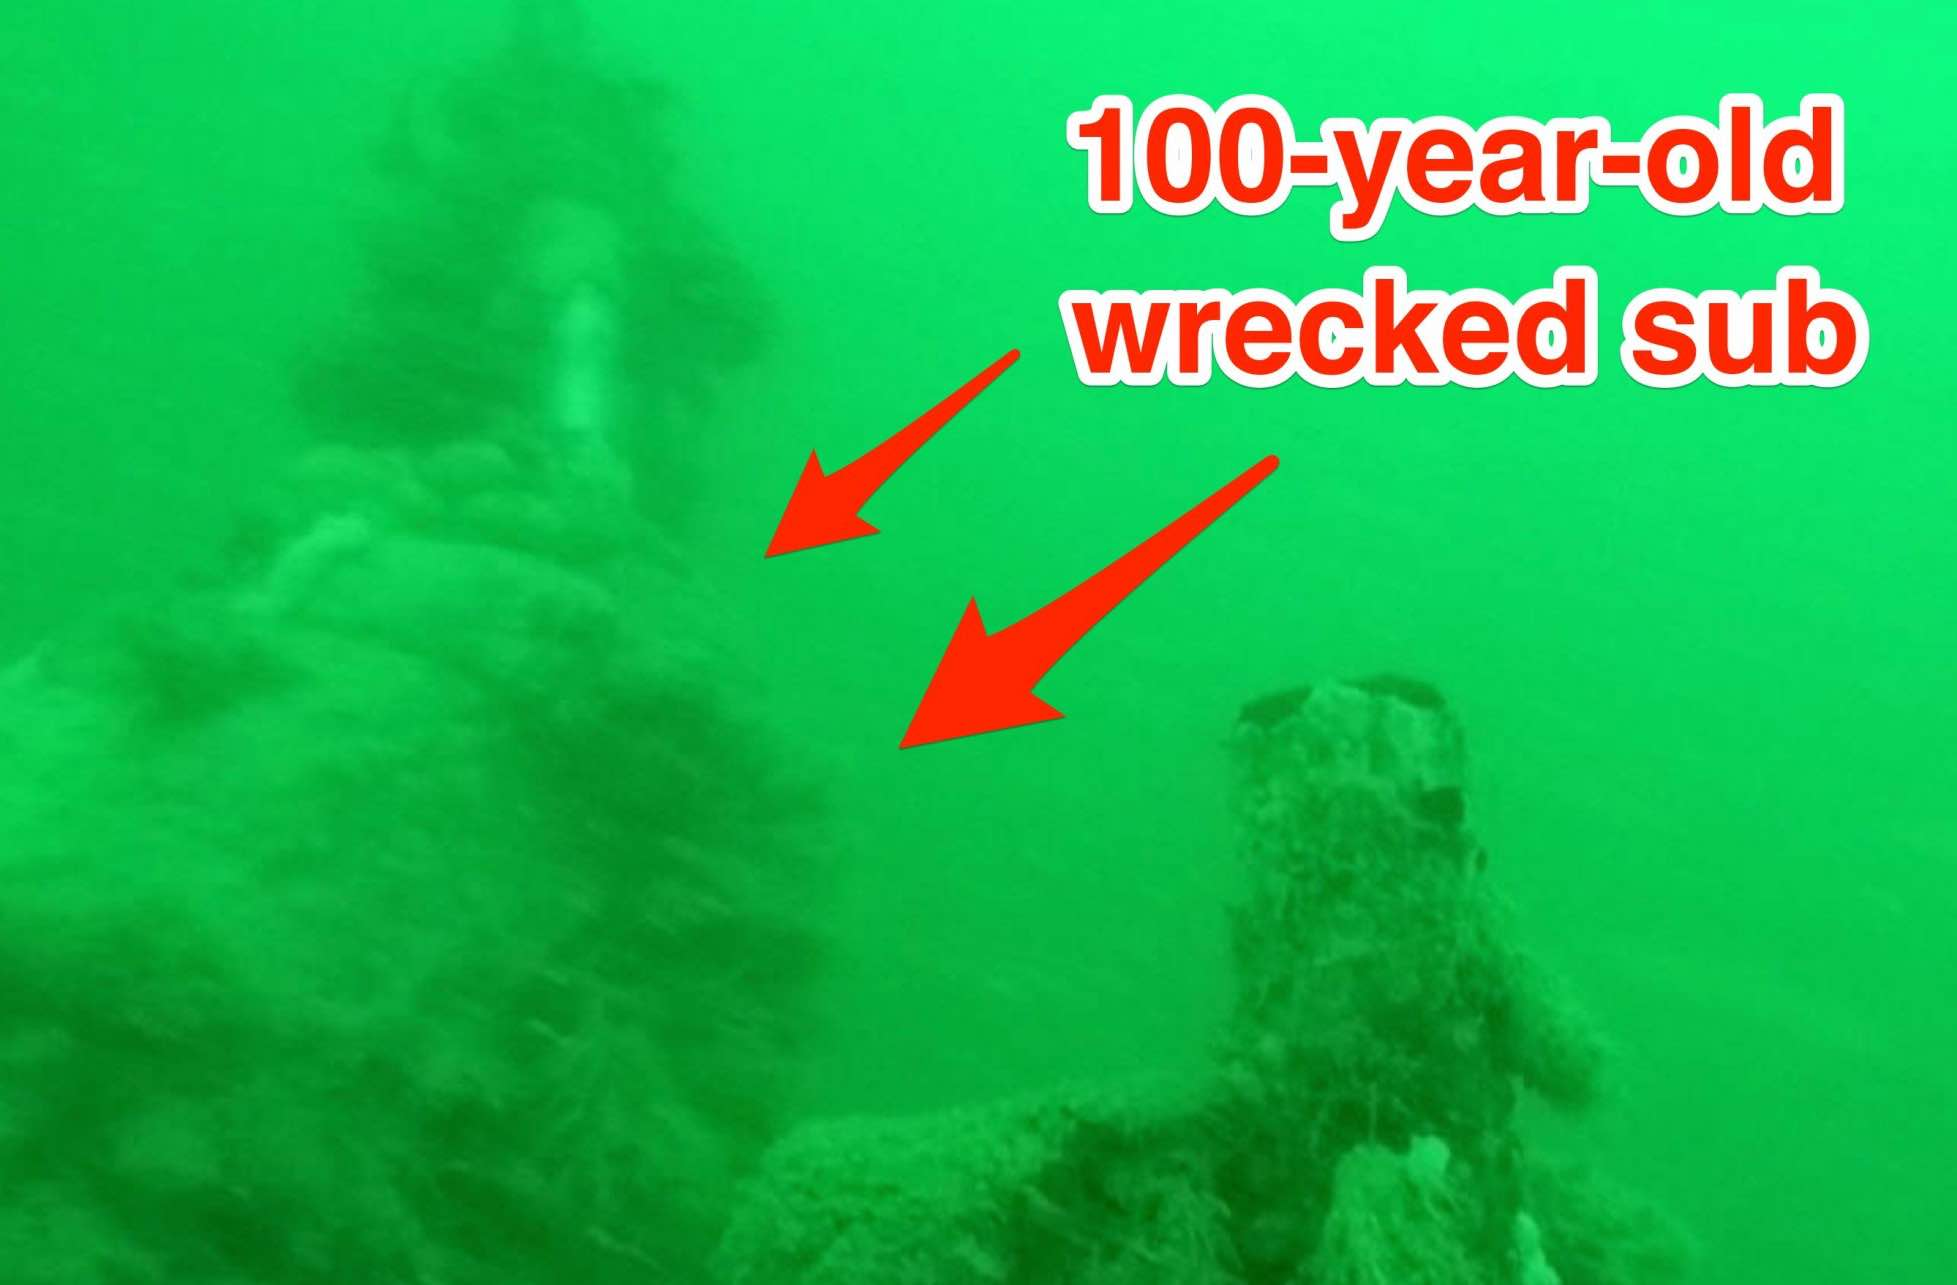 Wreck Of WW1 U-boat Found Off Belgium (Video) - Web Top News